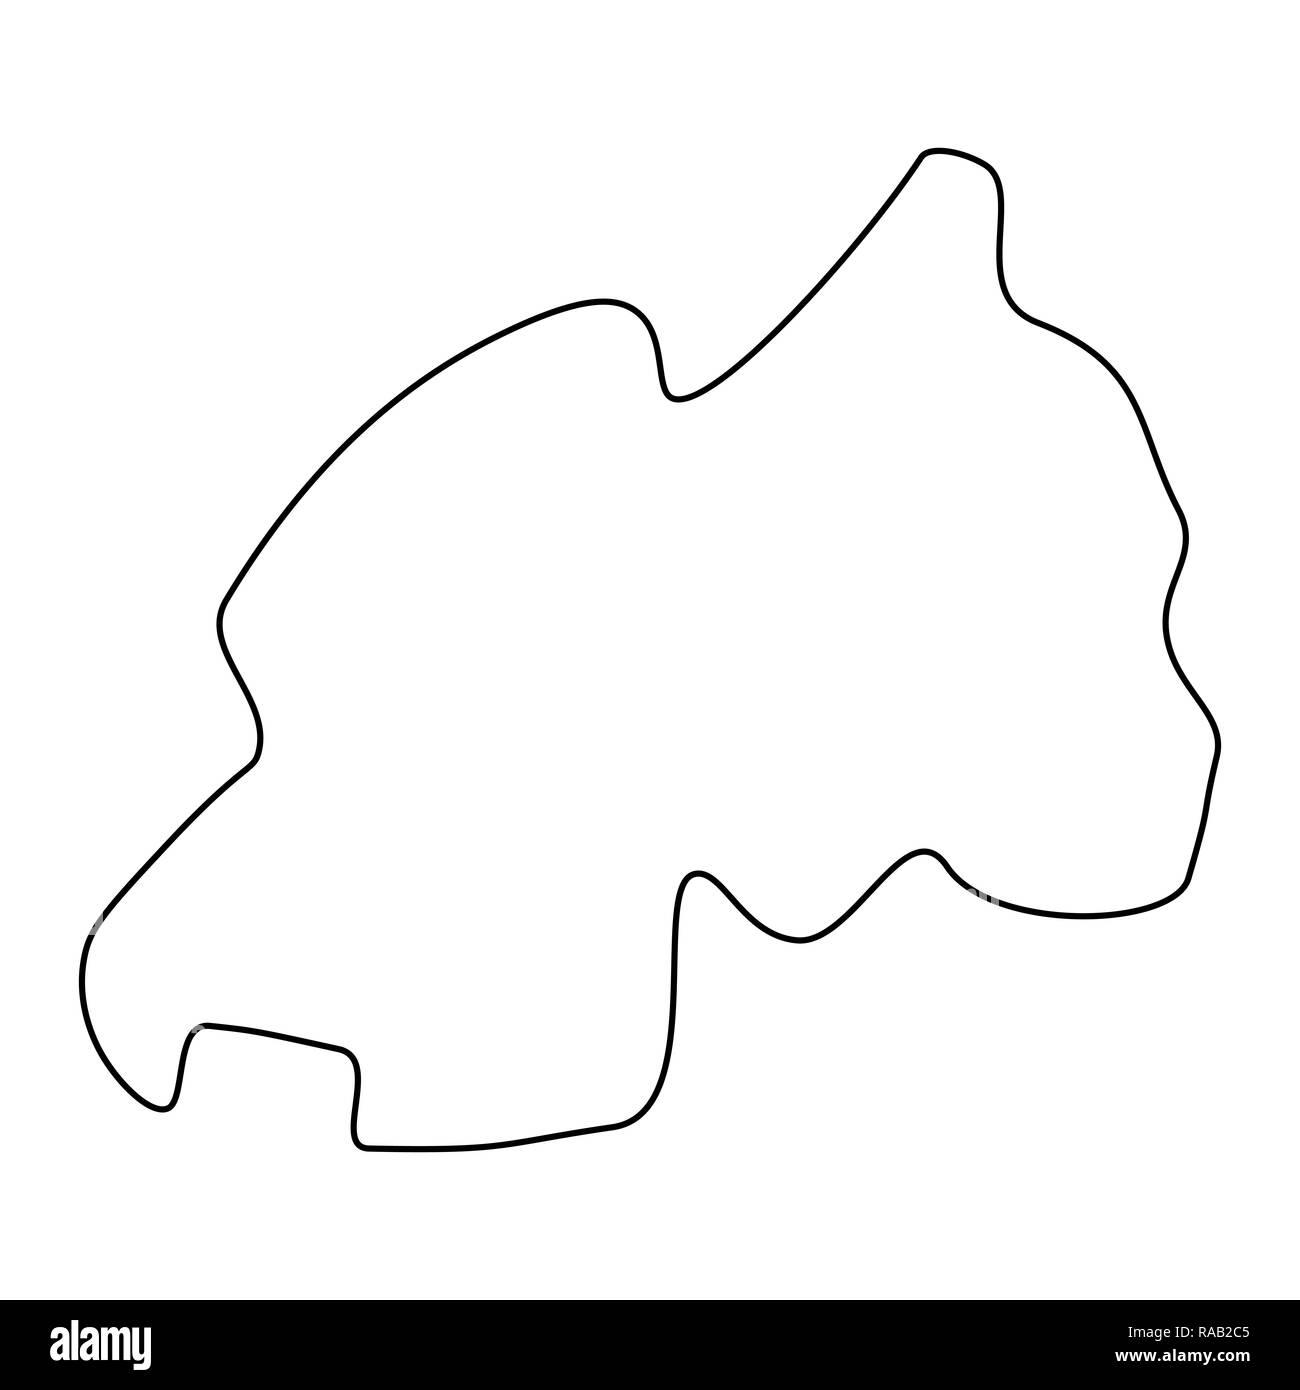 map of Rwanda - outline. Silhouette of Rwanda map  illustration - Stock Image